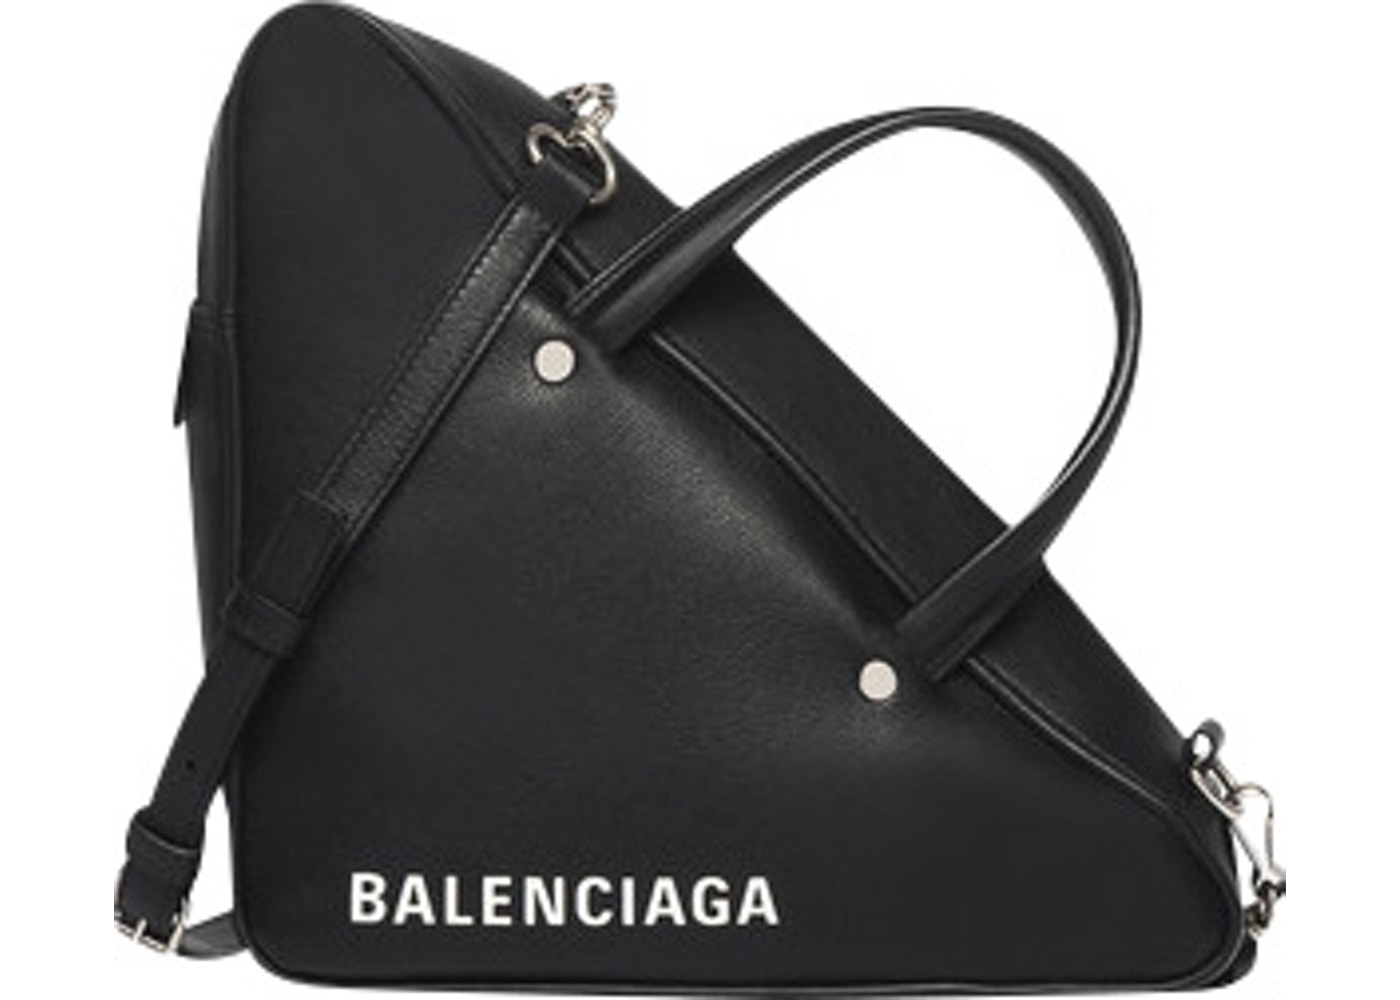 ac1efc14e7e7 Balenciaga Triangle Duffle XS Black. XS Black